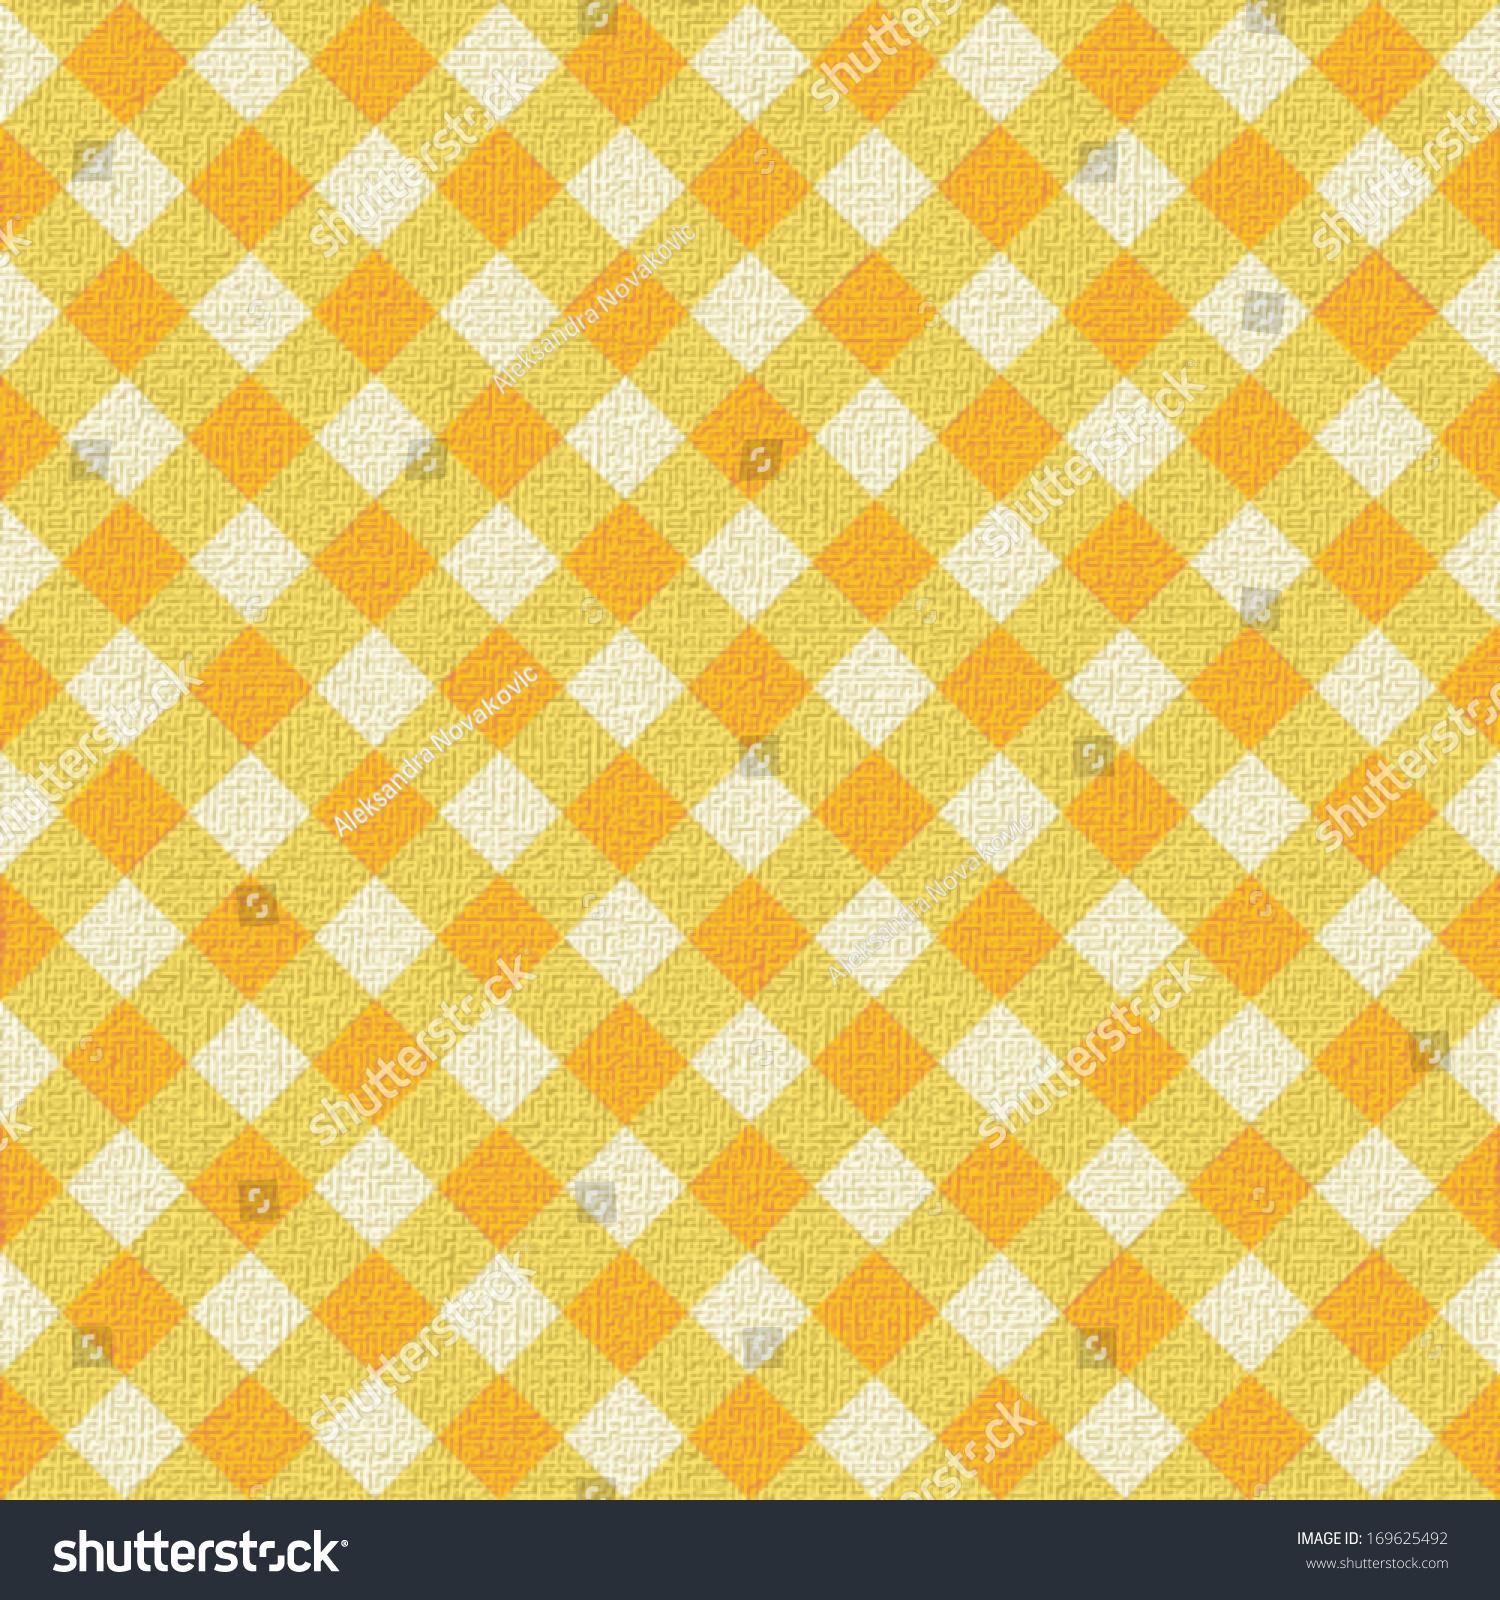 Wonderful Yellow Plaid Tablecloth